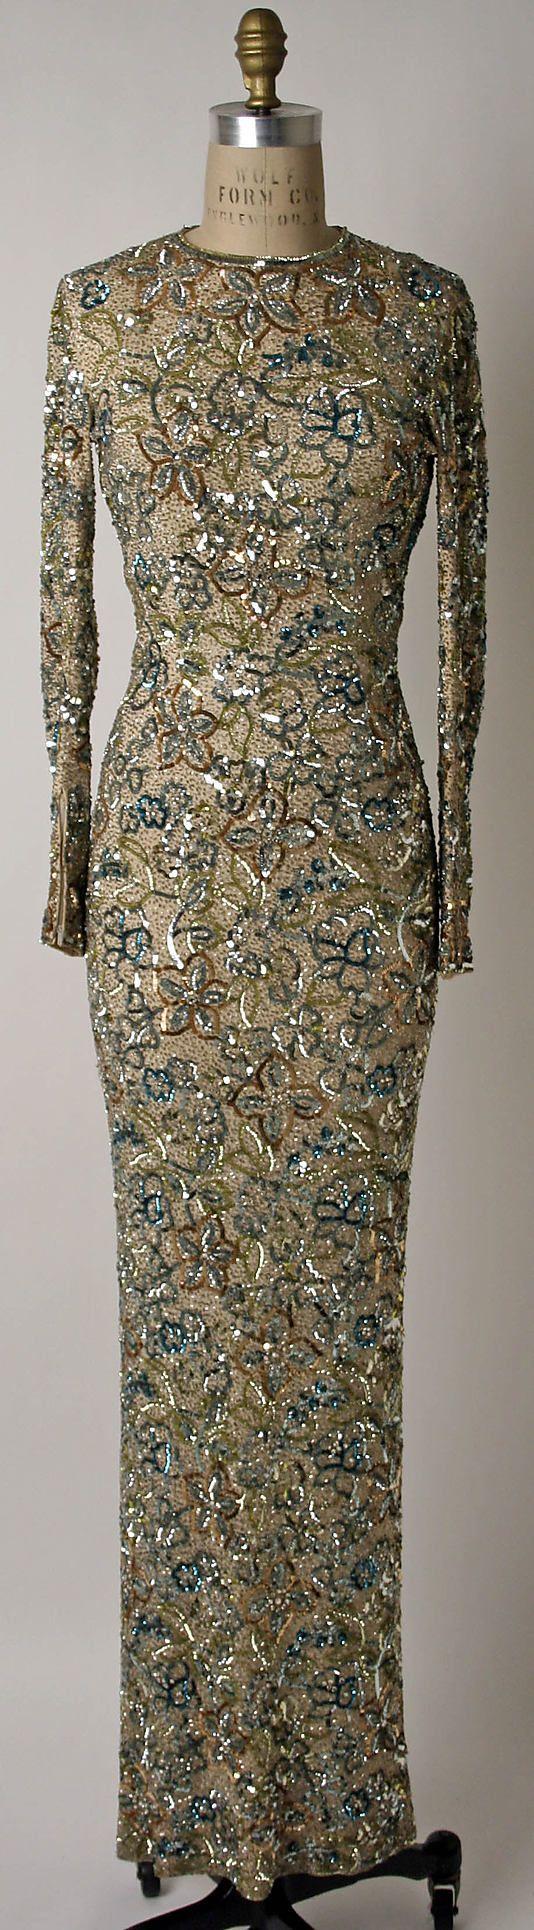 Dress, Evening  Norman Norell (American, Noblesville, Indiana 1900–1972 New York City)  Date: 1950–65 Culture: American Medium: silk, plastic, rhinestones